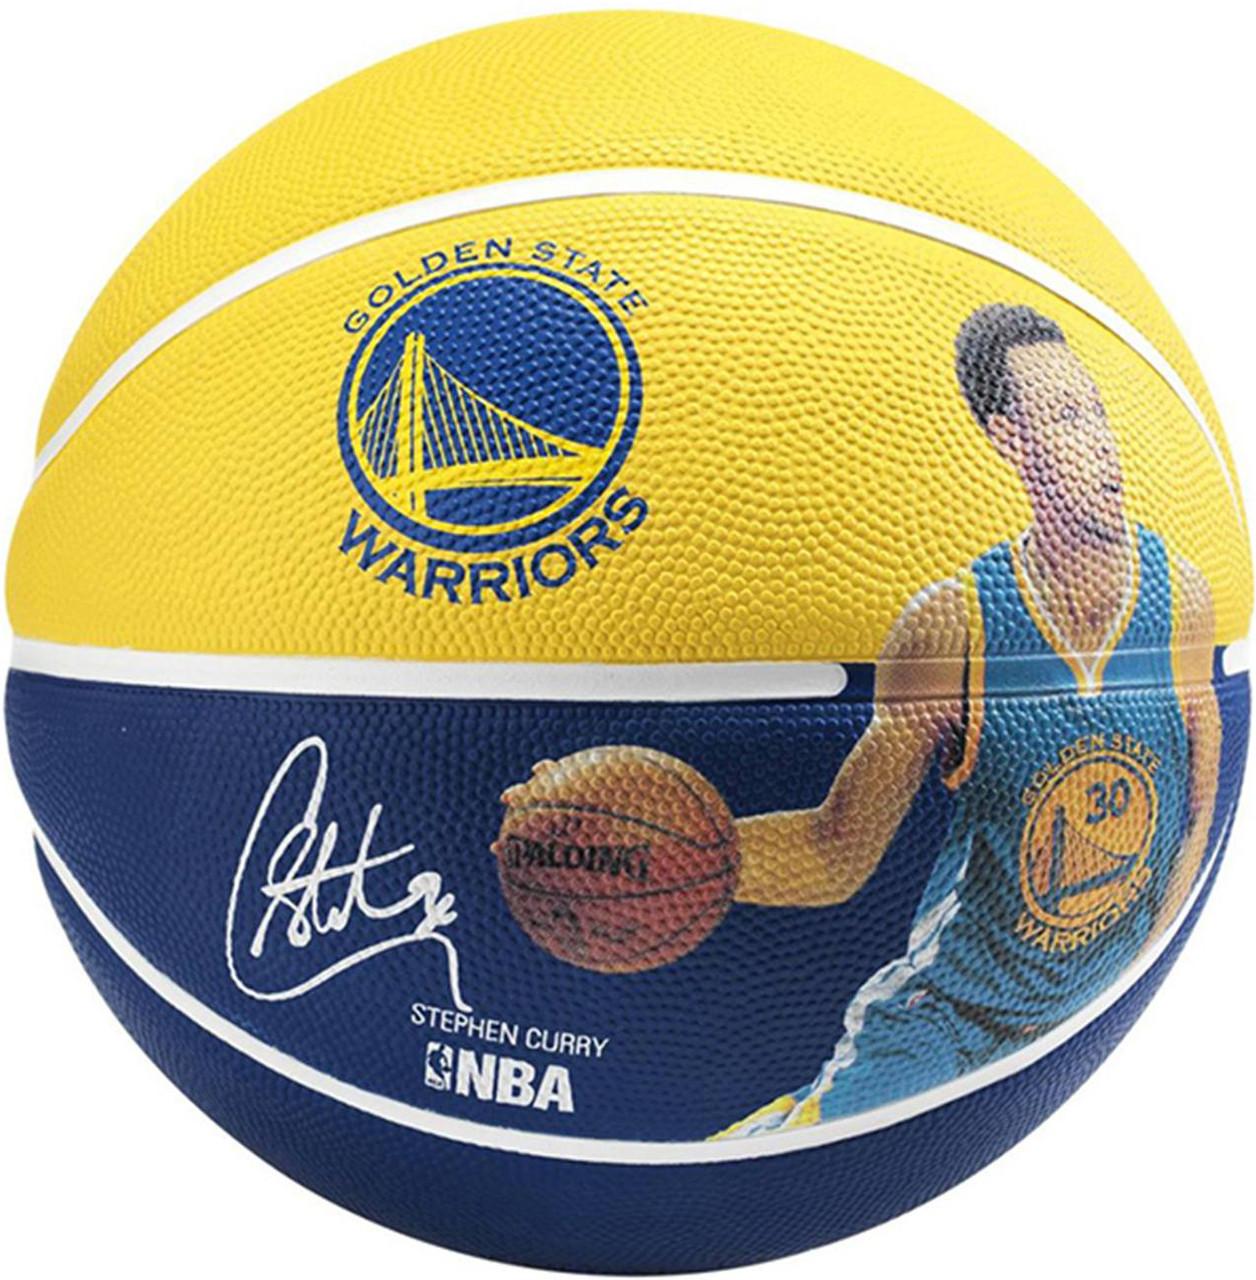 Мяч баскетбольный Spalding NBA Player Stephen Curry Size 7